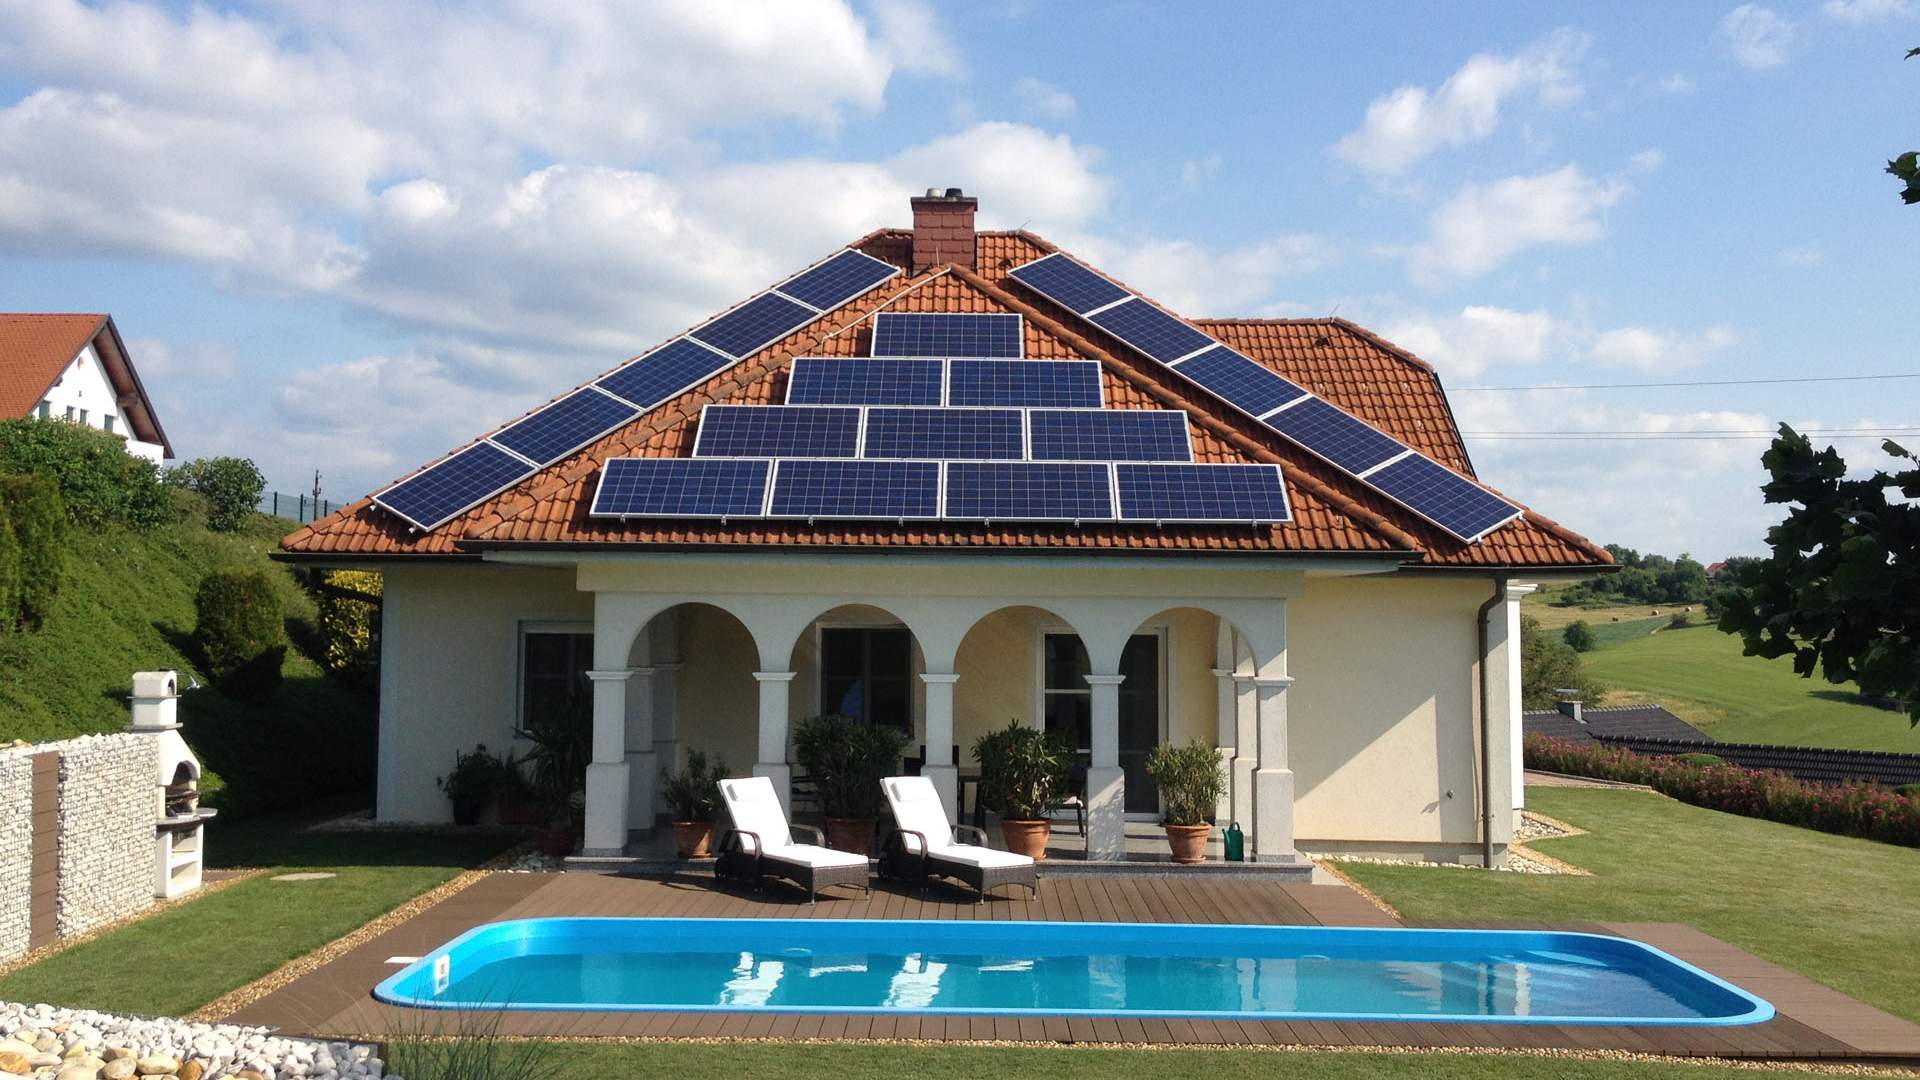 photovoltaik sonnen windenergieanlagen sparen kosten. Black Bedroom Furniture Sets. Home Design Ideas